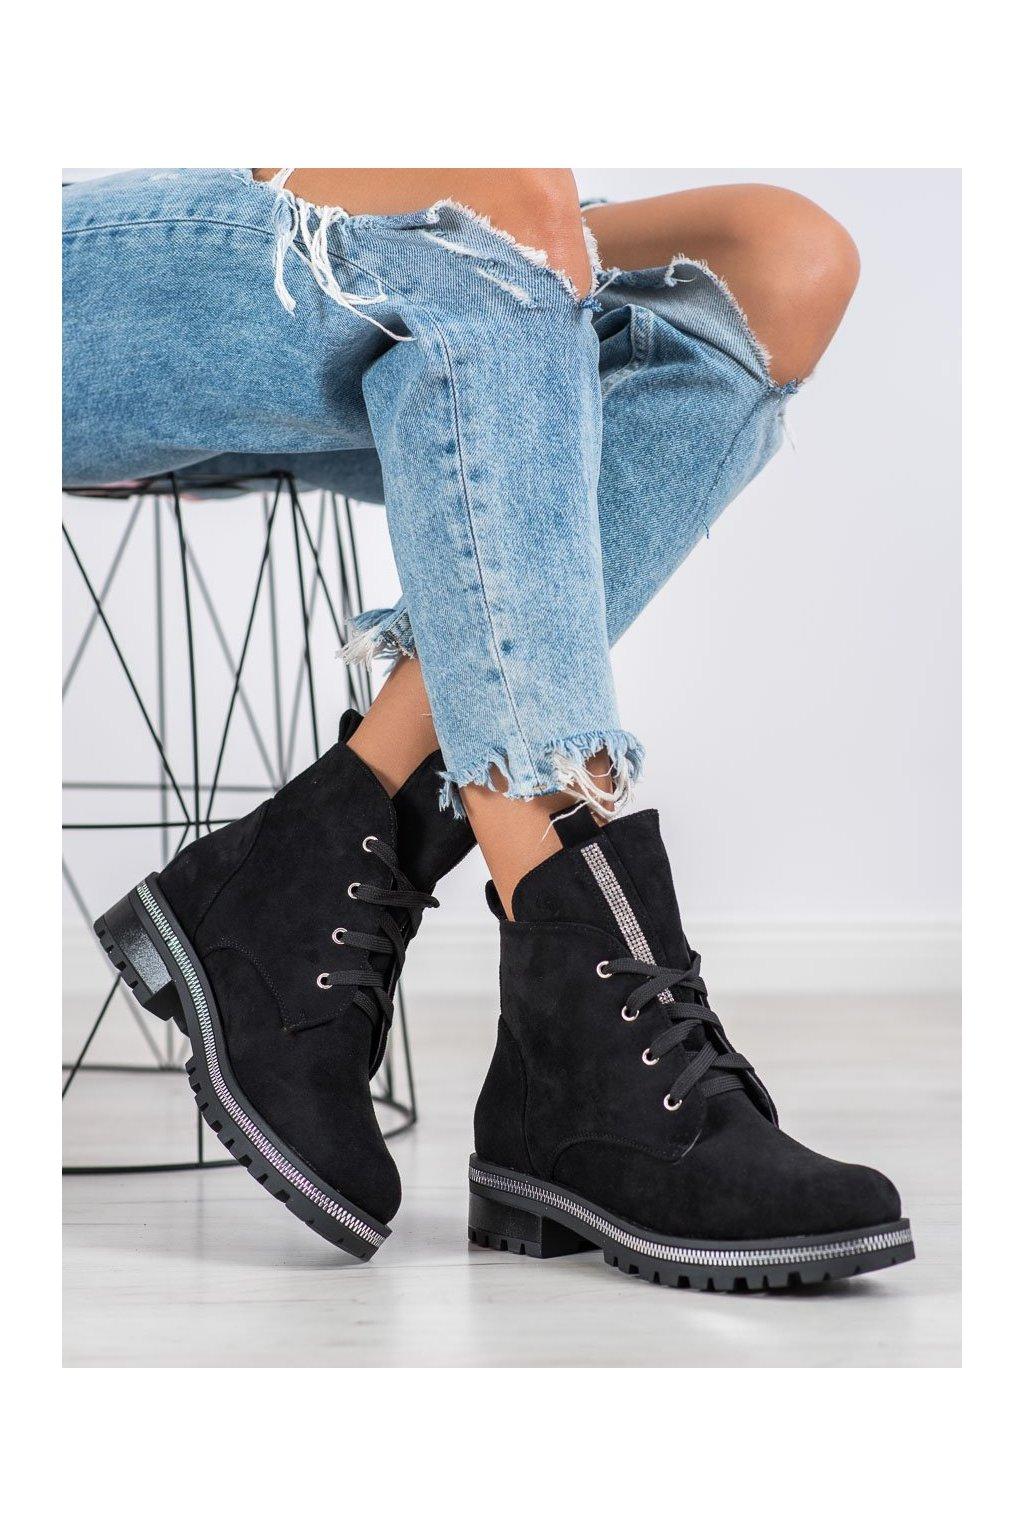 Čierne dámske topánky Seastar kod NC1035B